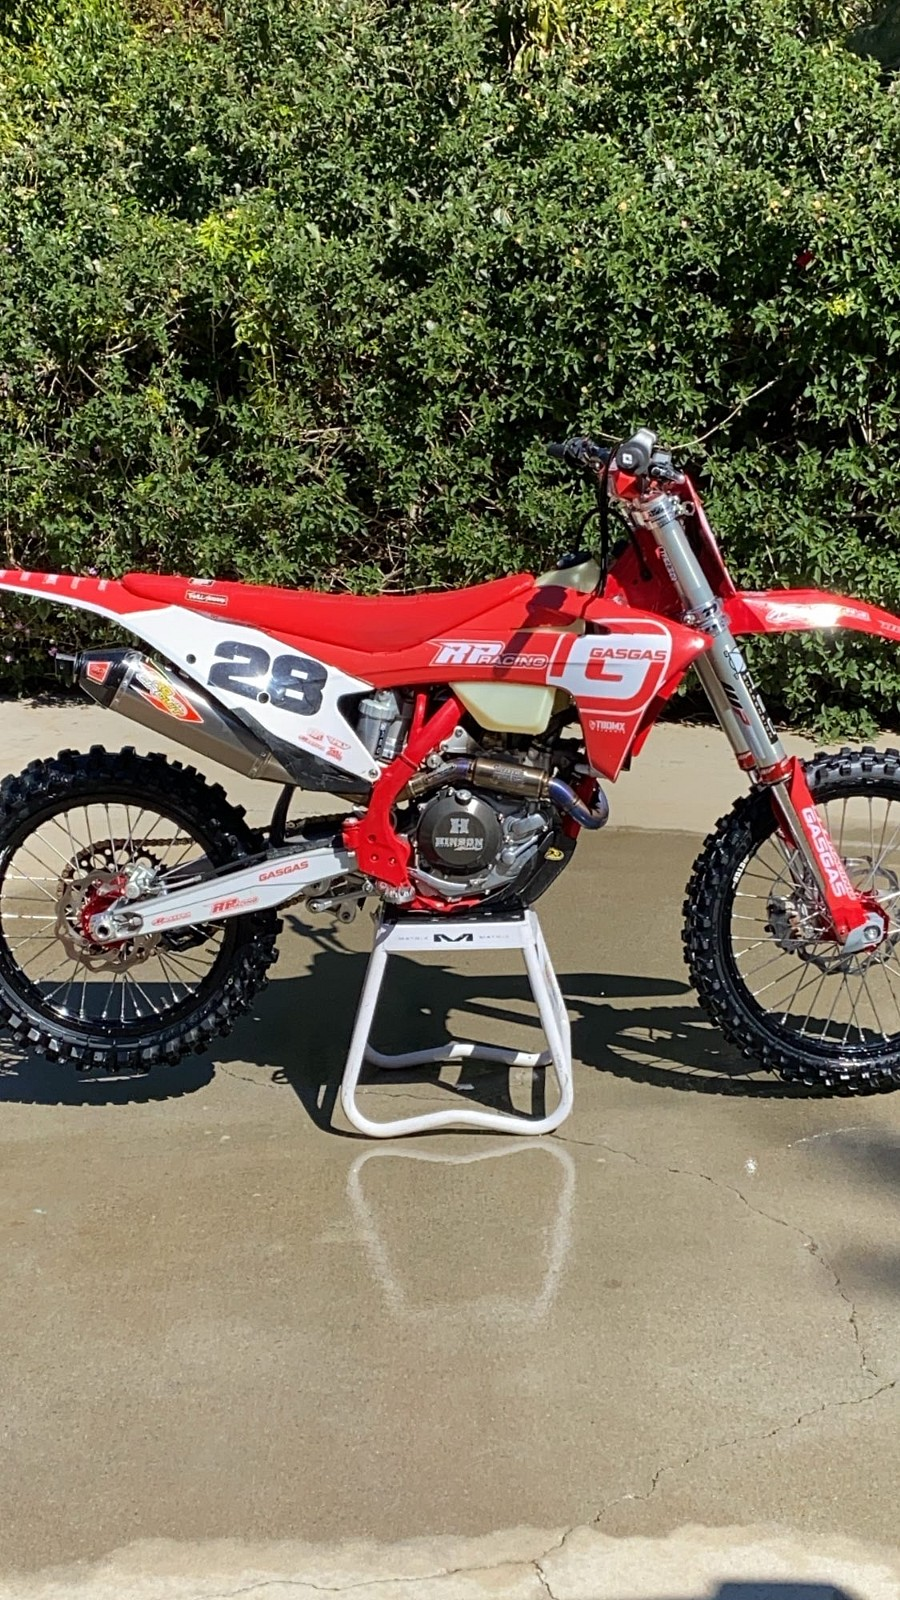 197E9B98-A042-4B76-BF46-2AB1F9F72313 - prida28 - Motocross Pictures - Vital MX